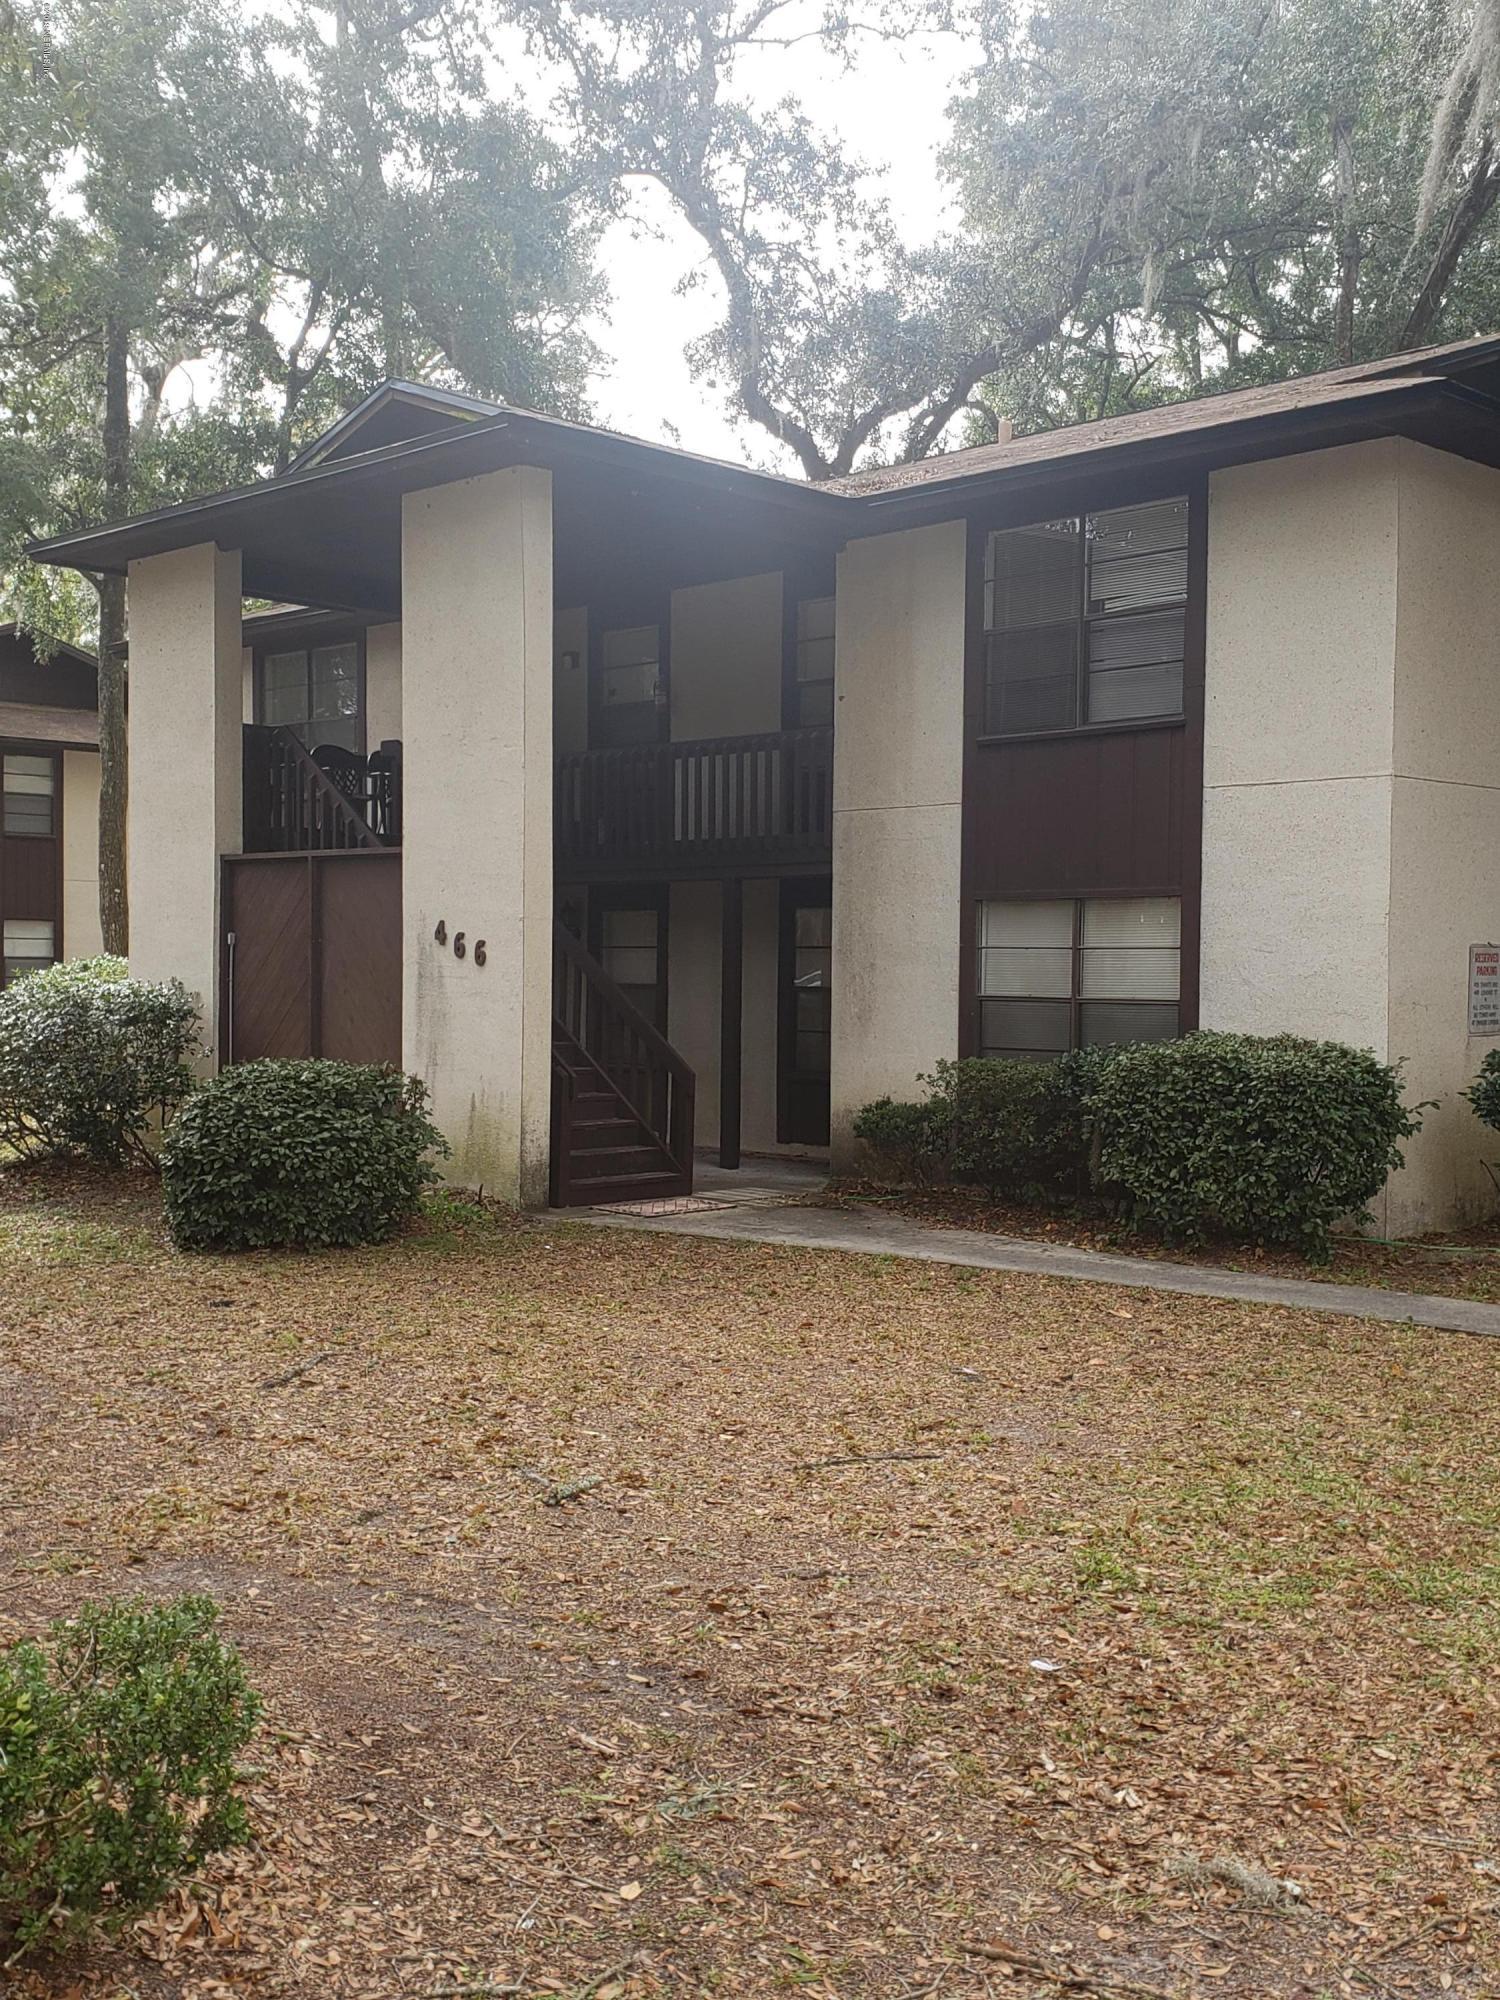 466 LOMBARD, ORANGE PARK, FLORIDA 32073, 2 Bedrooms Bedrooms, ,1 BathroomBathrooms,Rental,For sale,LOMBARD,1030255